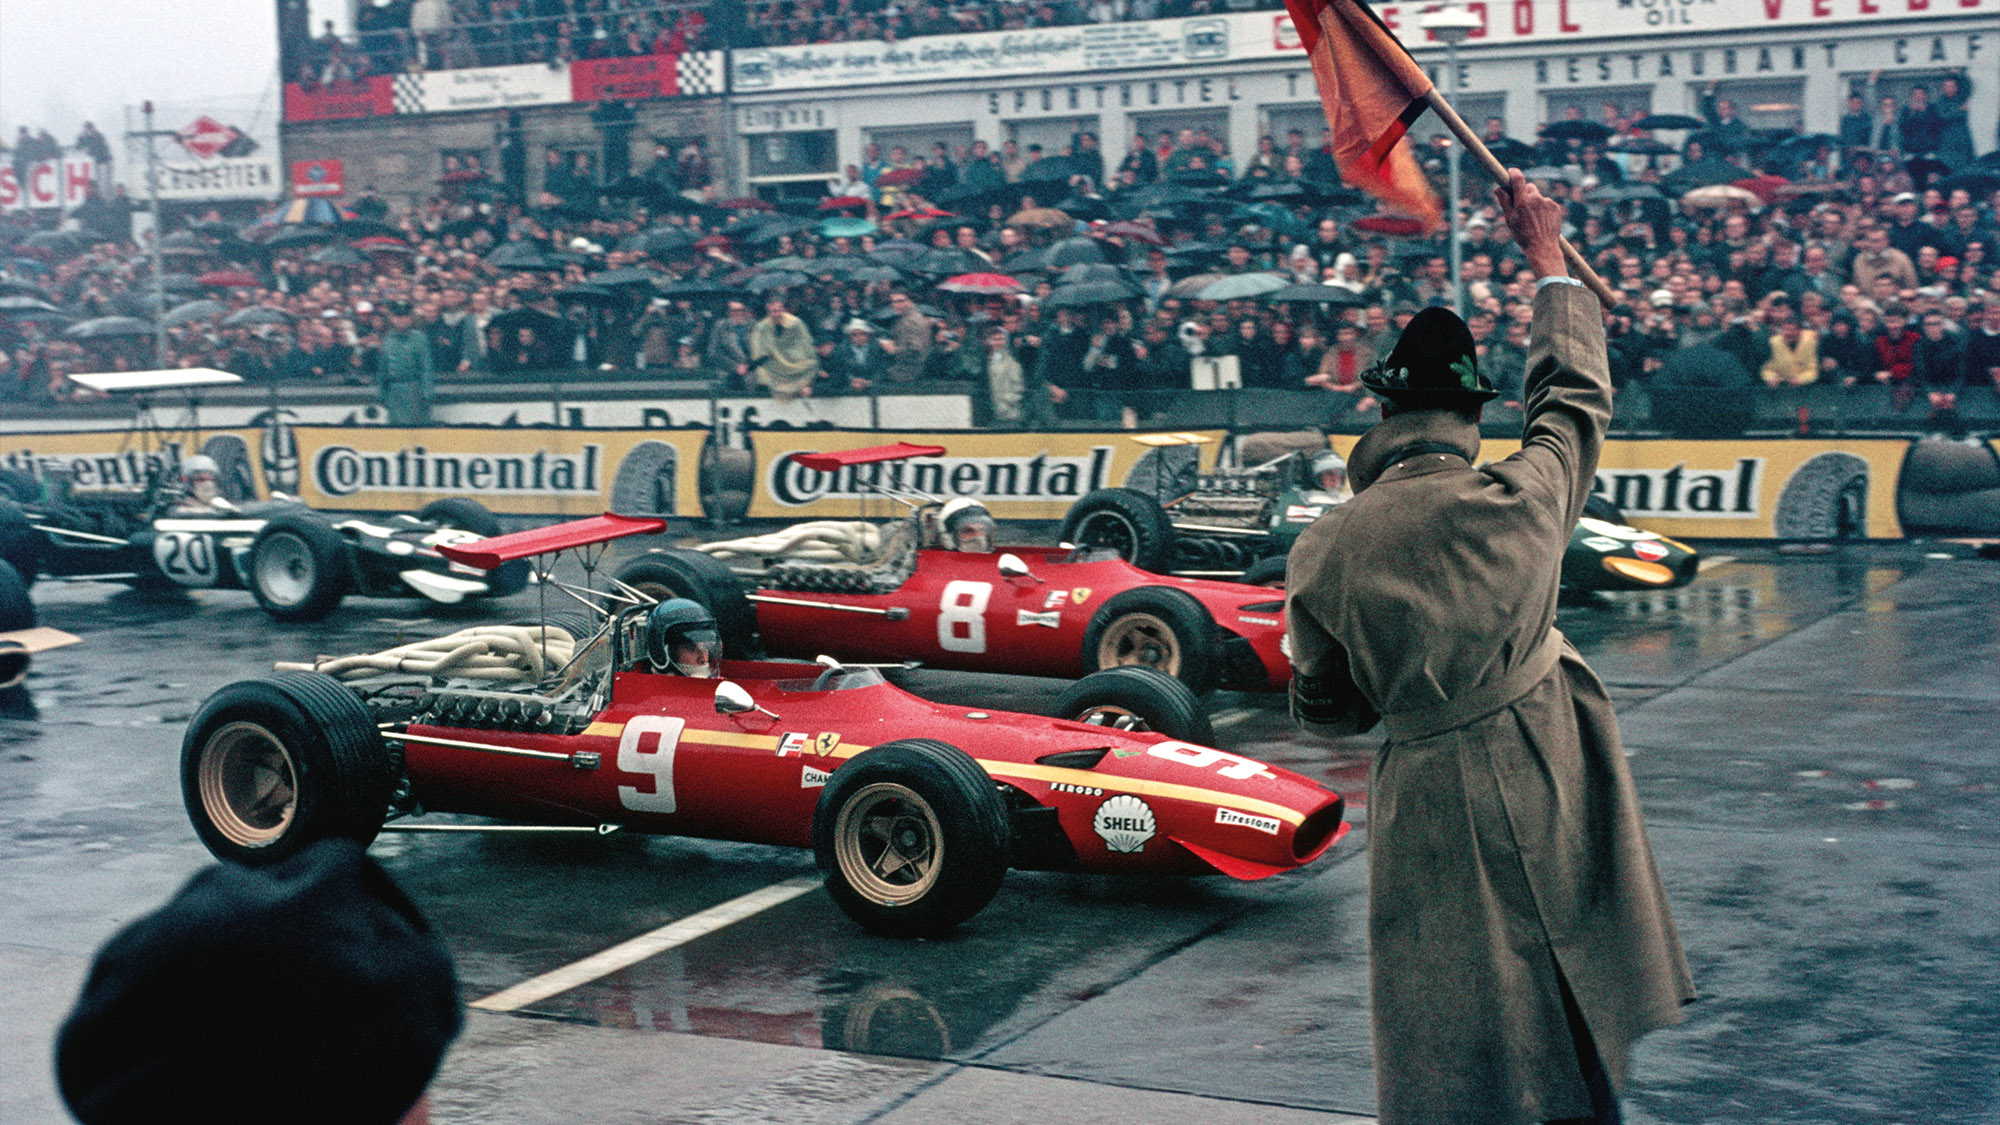 Start of the 1968 German Grand Prix at the Nurburgring